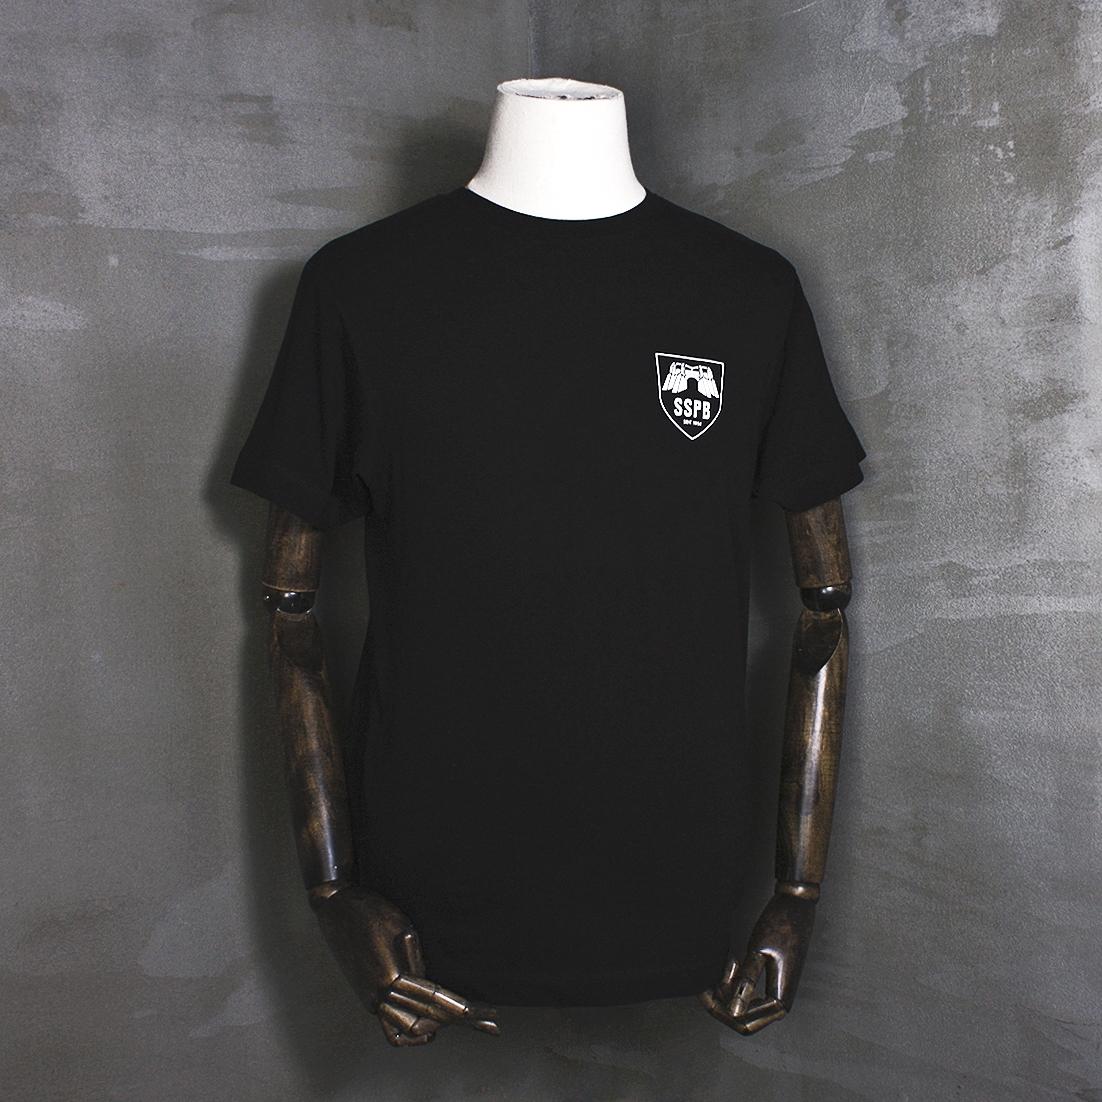 SSPB_Shirt_Front_2.jpg